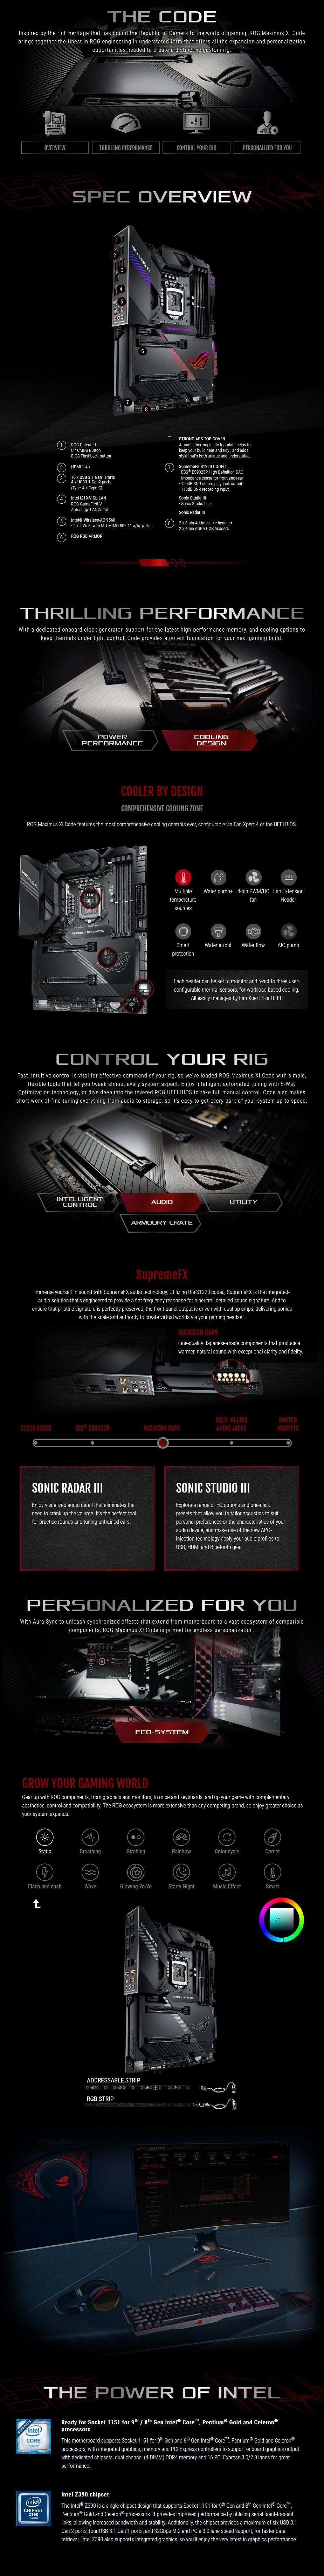 ASUS ROG Z390 MAXIMUS XI CODE LGA 1151 ATX Motherboard - Desktop Overview 1